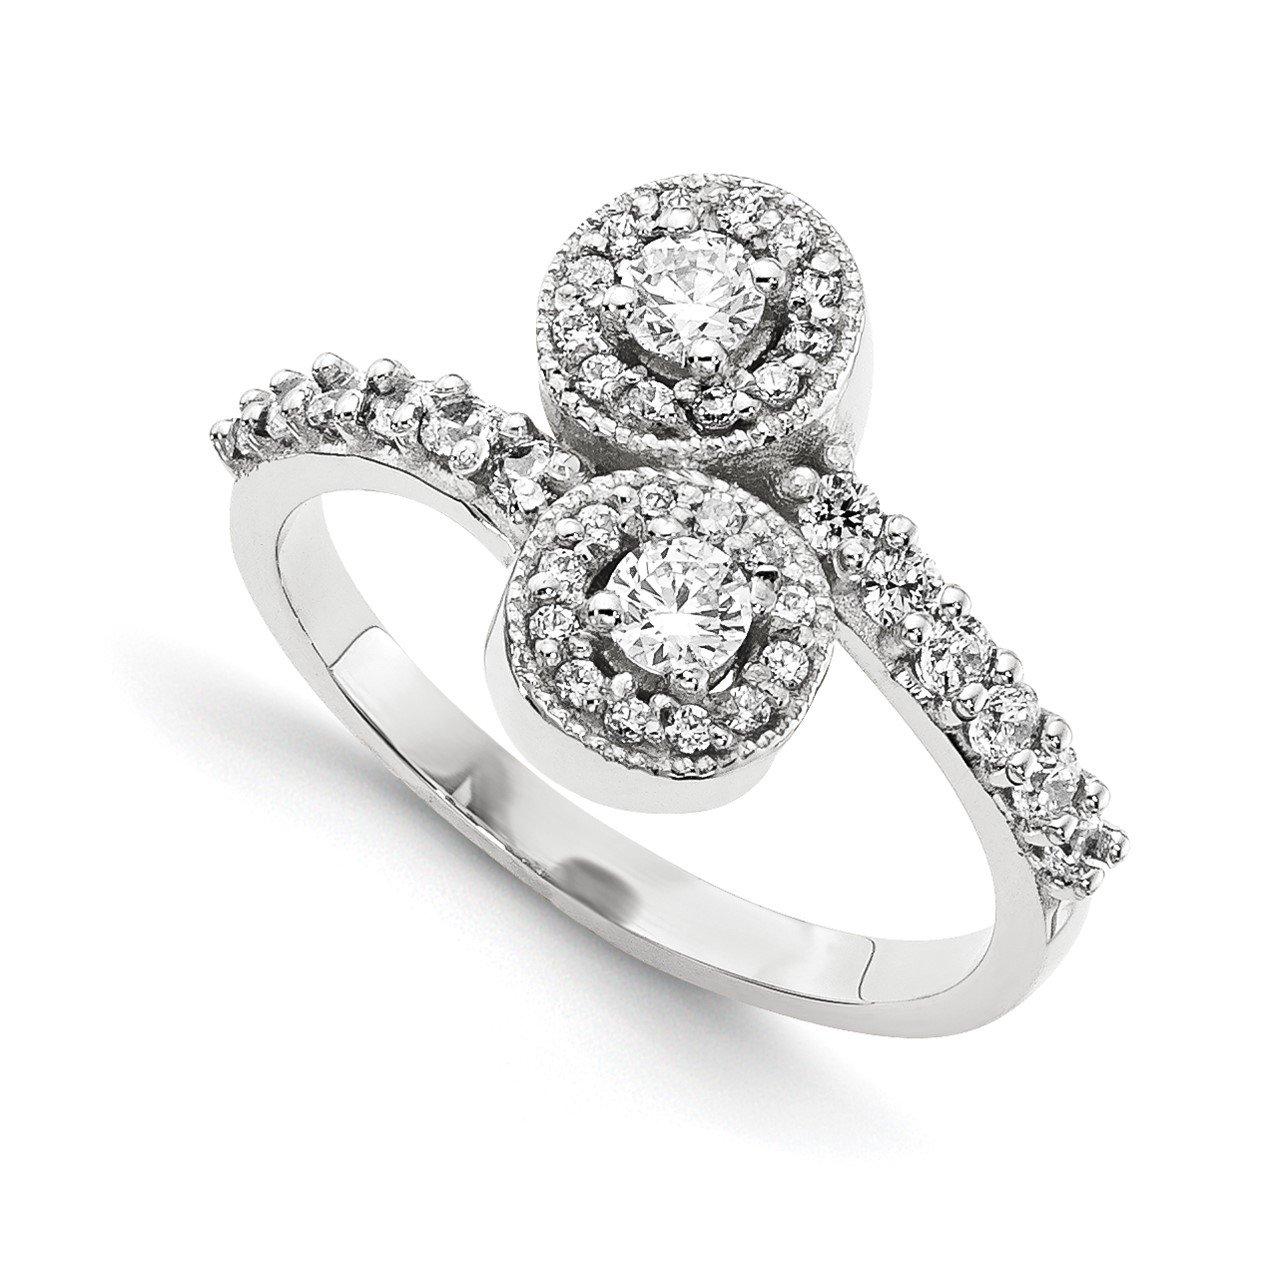 14KW VS Diamond 2-stone Ring Semi-Mount - 3 mm center stones